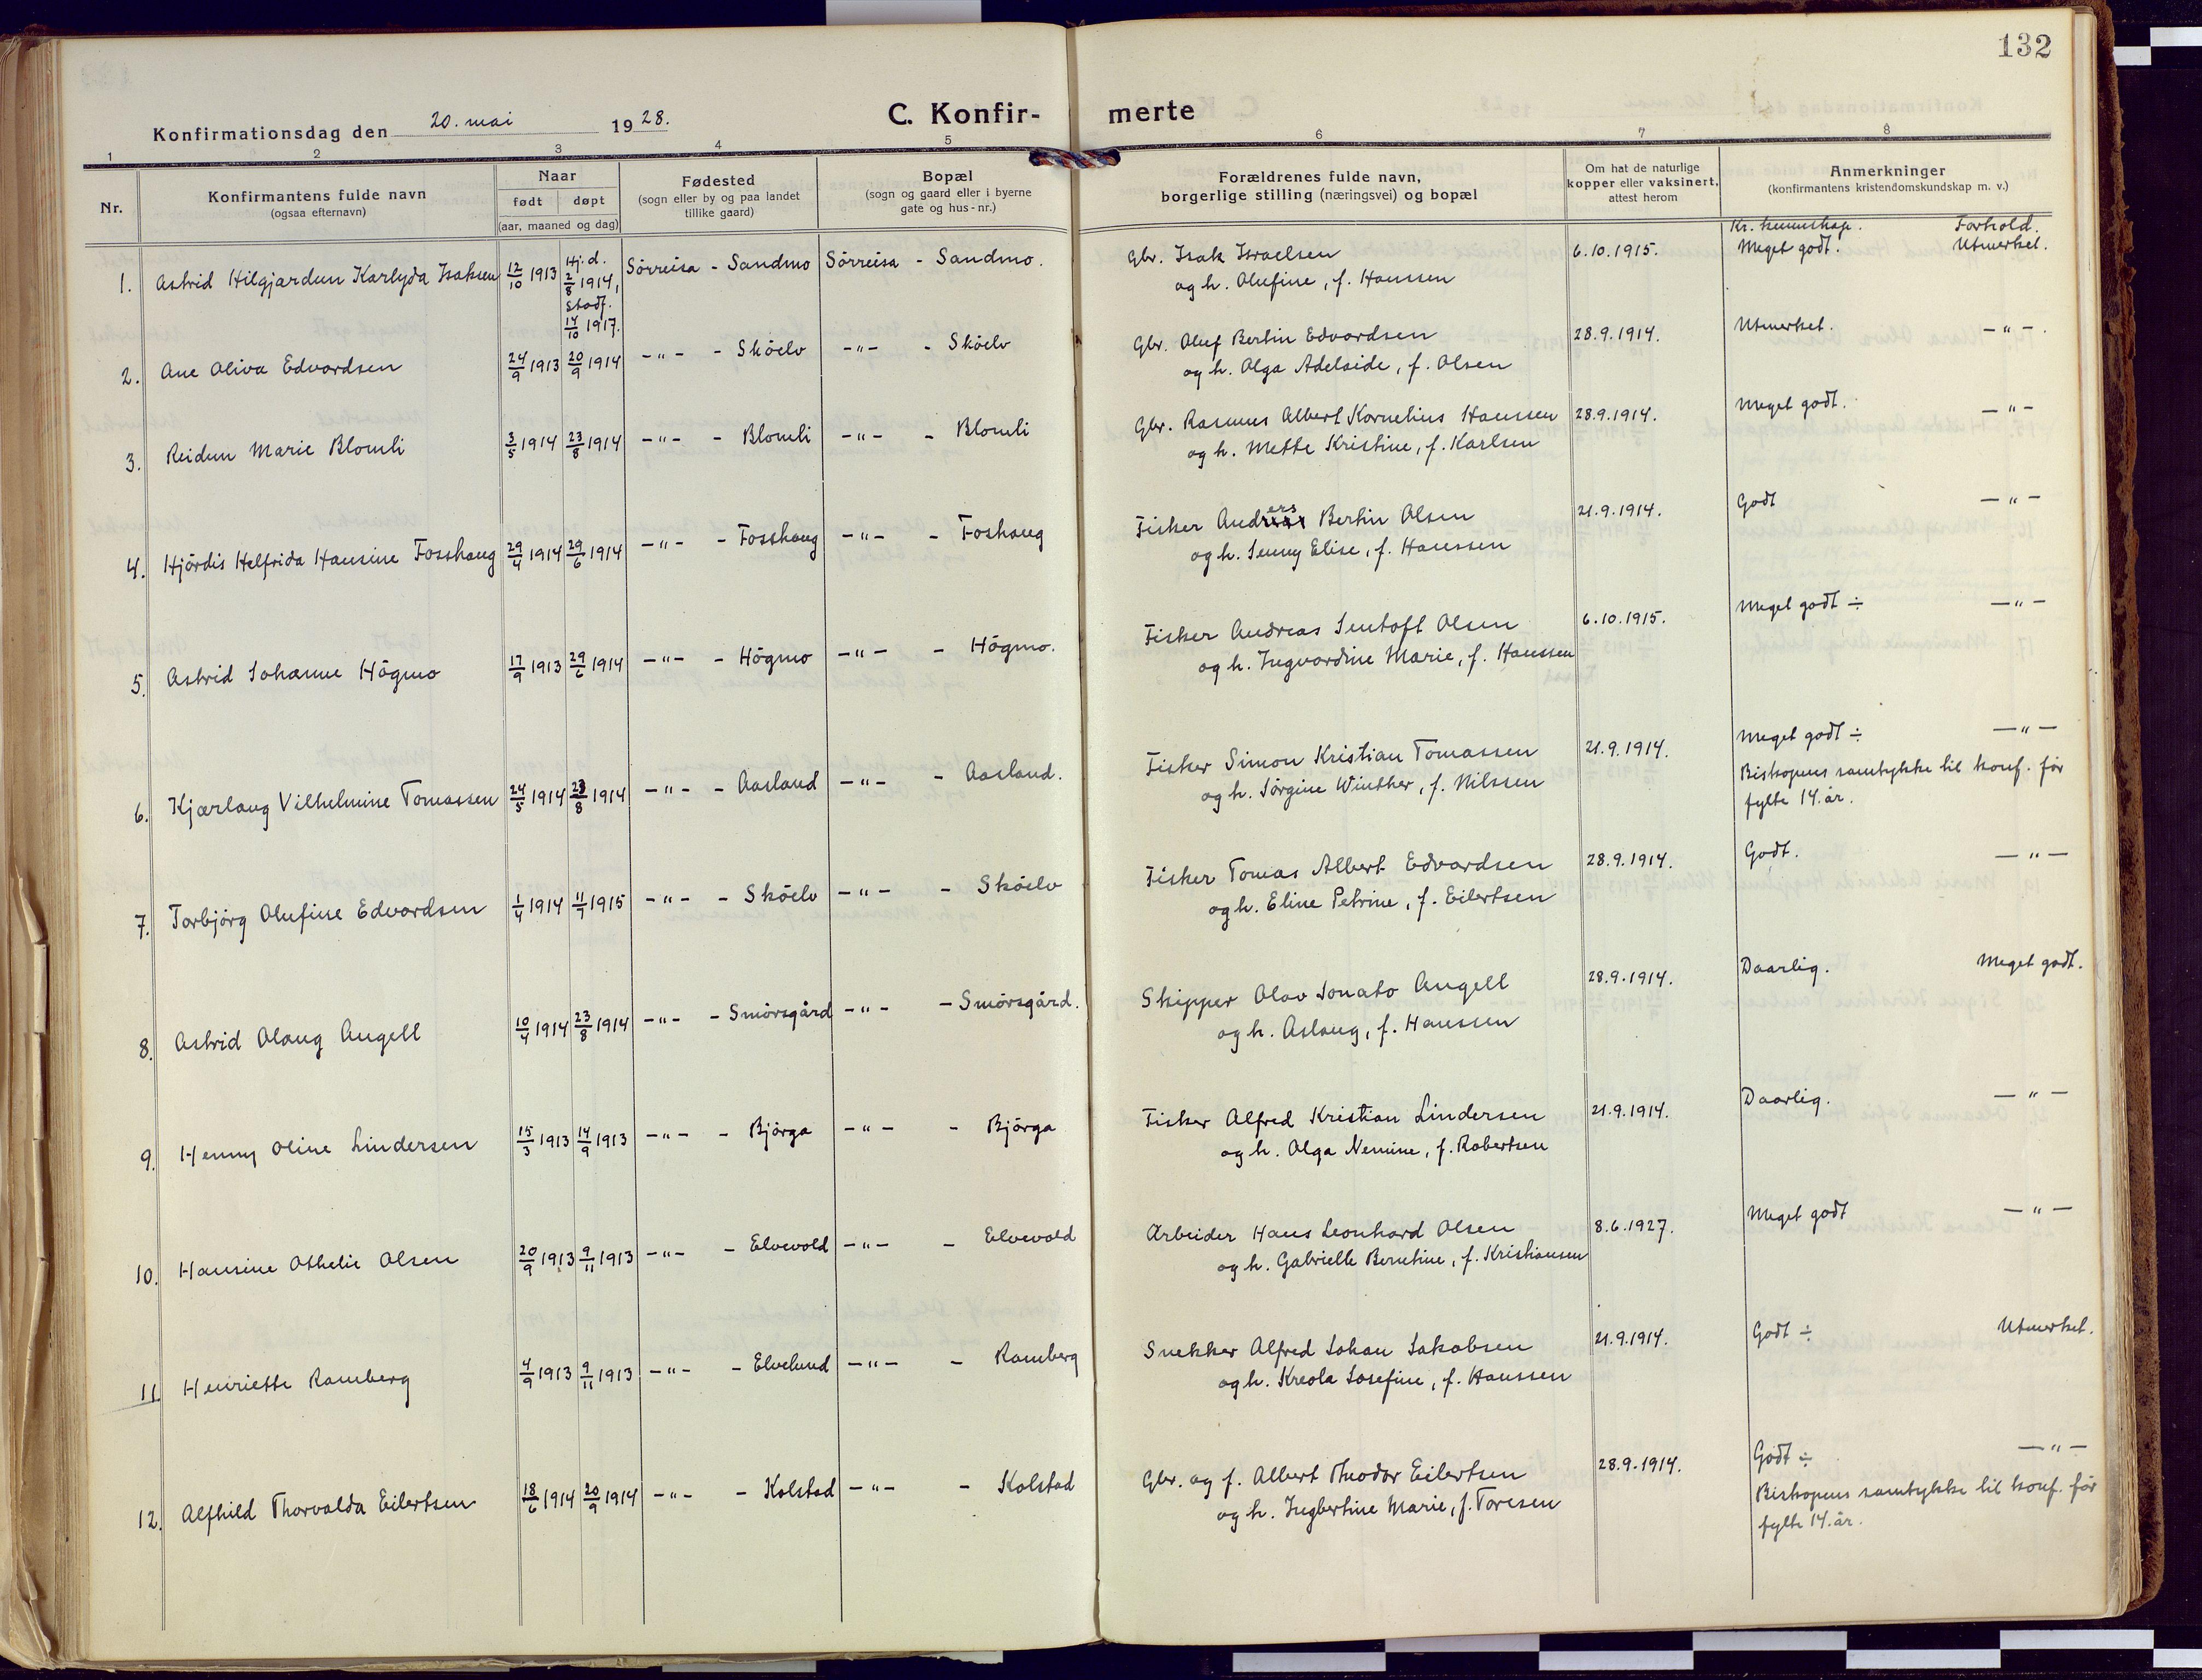 SATØ, Tranøy sokneprestkontor, I/Ia/Iaa/L0015kirke: Ministerialbok nr. 15, 1919-1928, s. 132